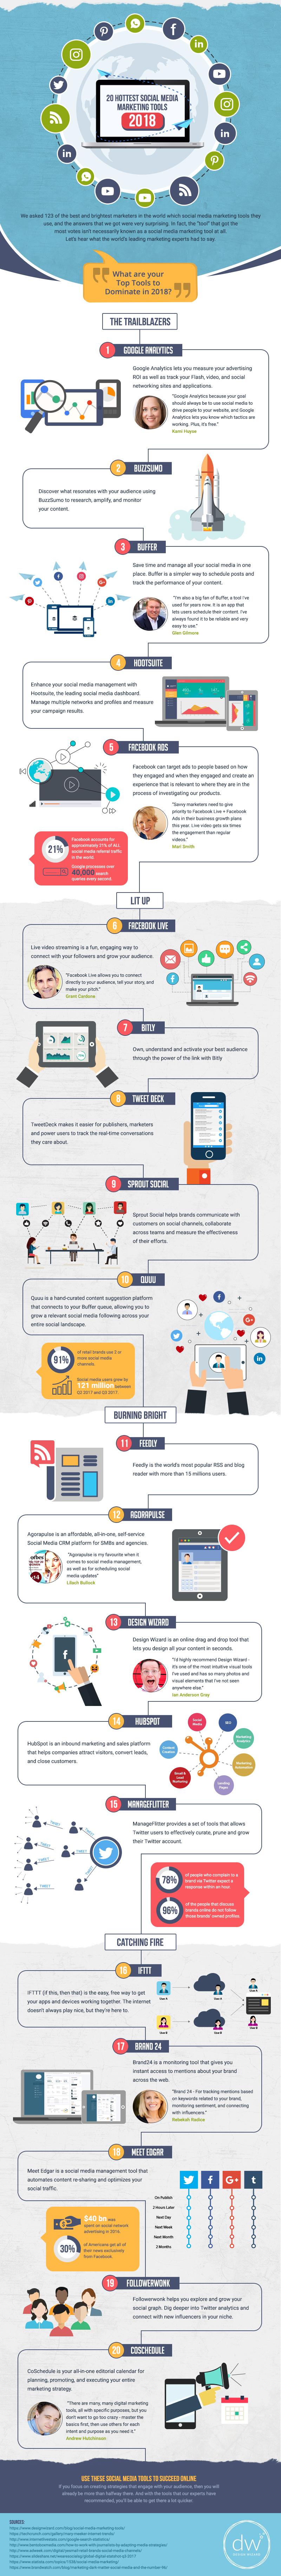 Hottest Social Media Marketing Tools